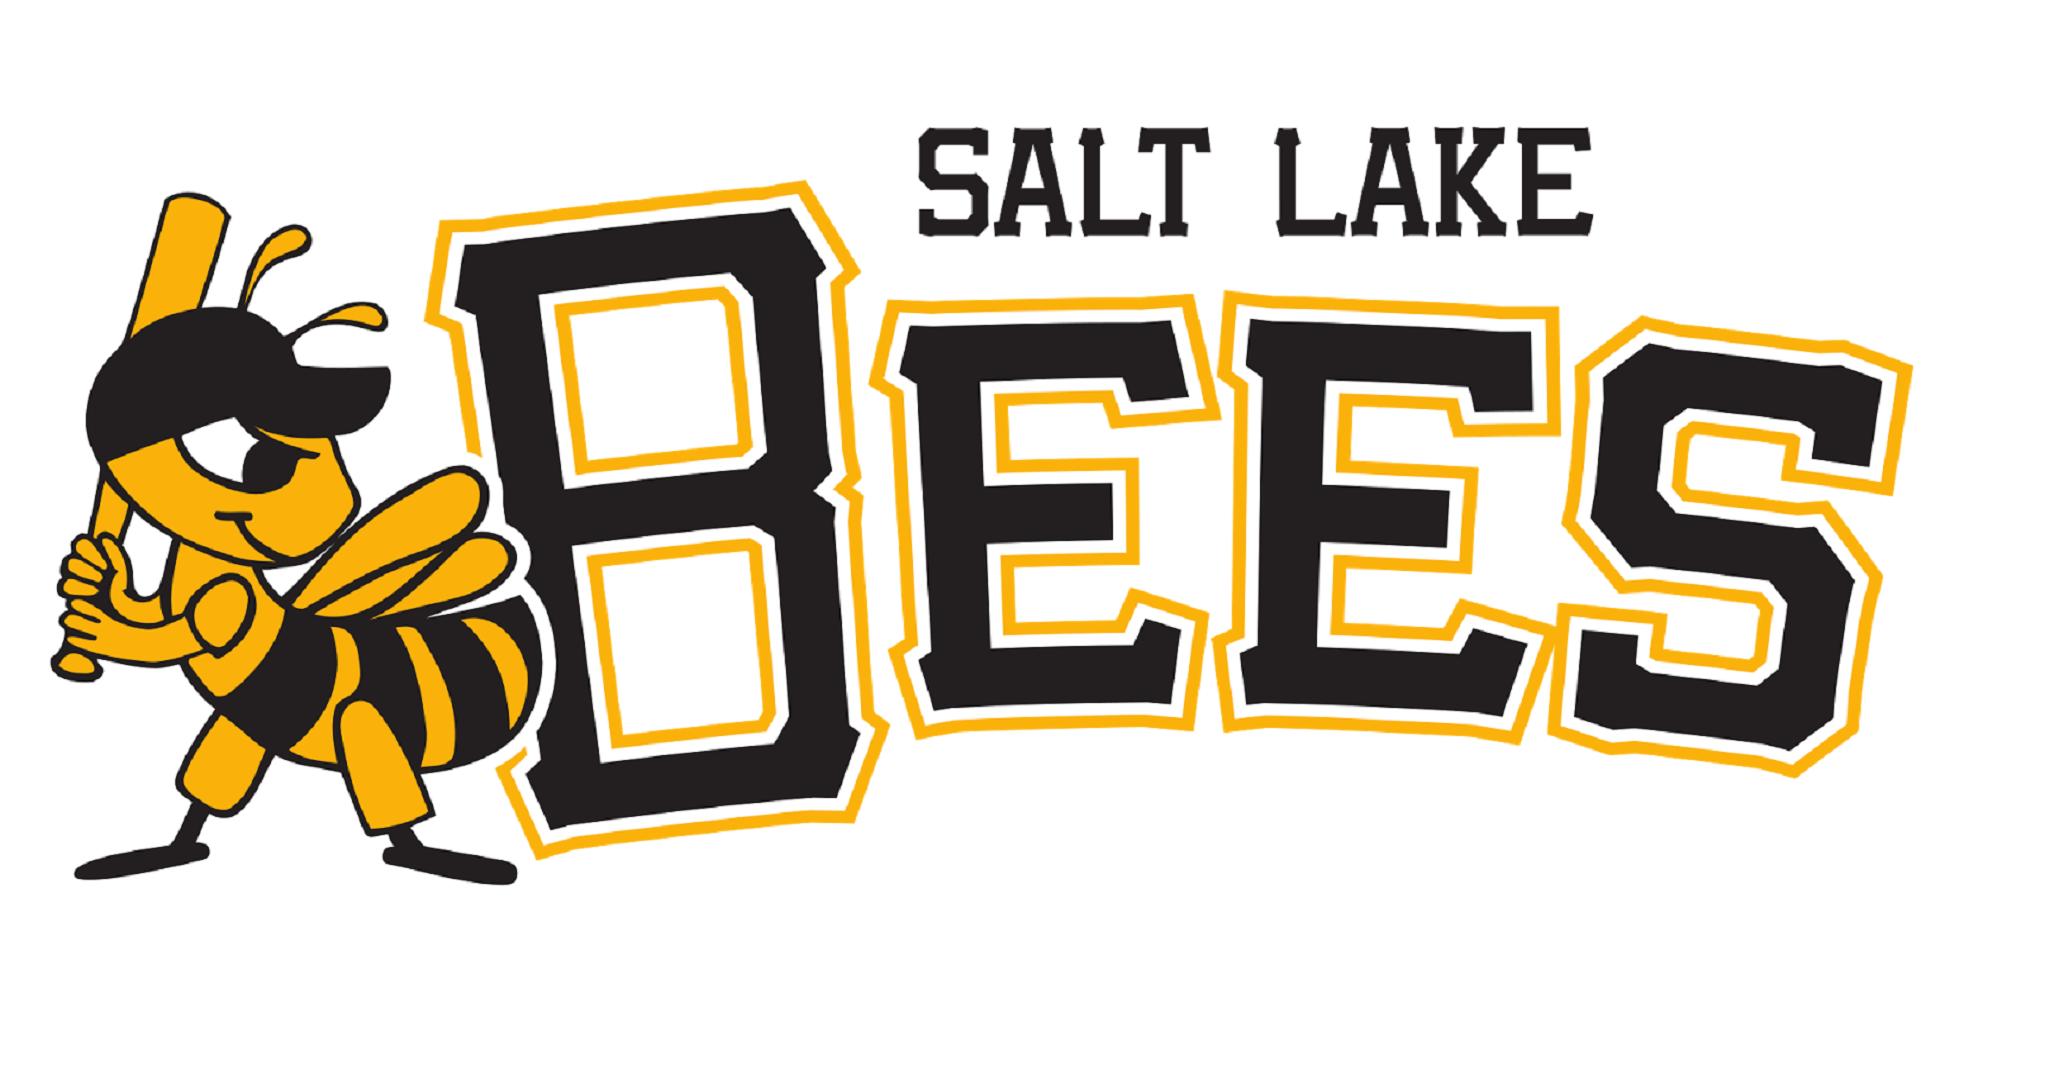 Salt-Lake-Bees-Computer-Wallpaper-HD